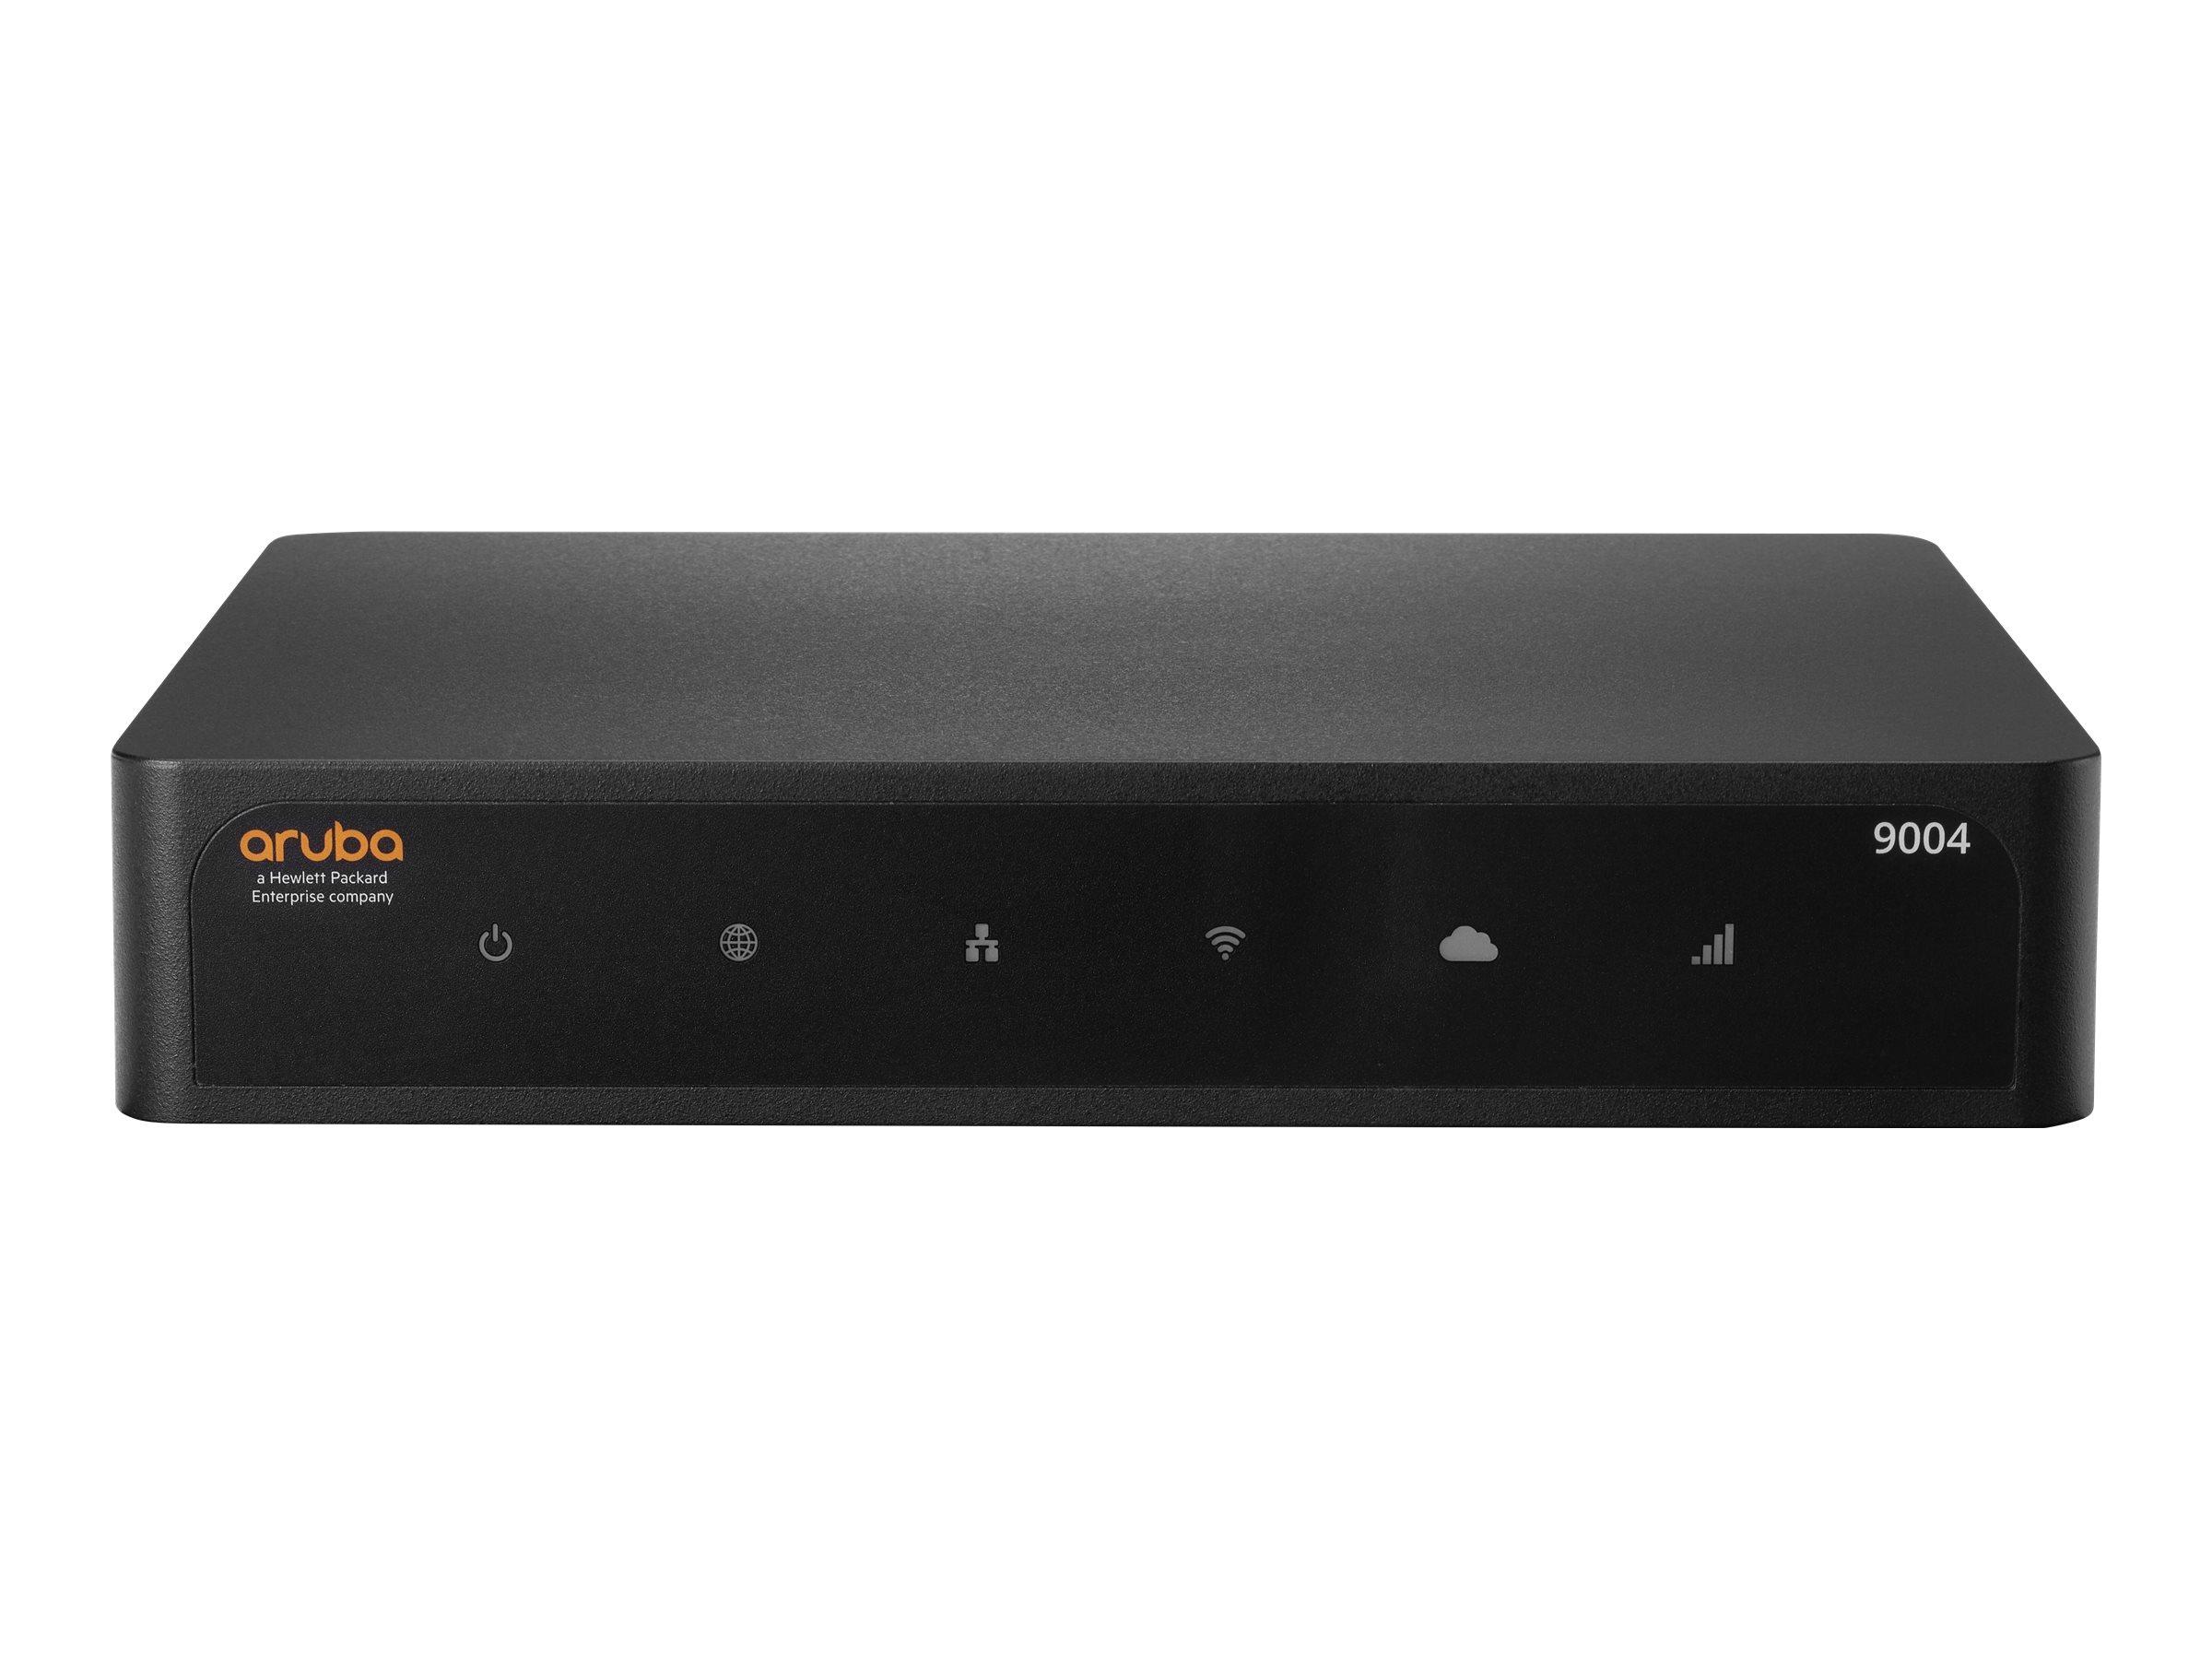 HPE Aruba 9004 (RW) - Gateway - 4 Anschlüsse - GigE, ZigBee, NFC, Bluetooth 5.0 - ZigBee, NFC, Bluetooth - BTO